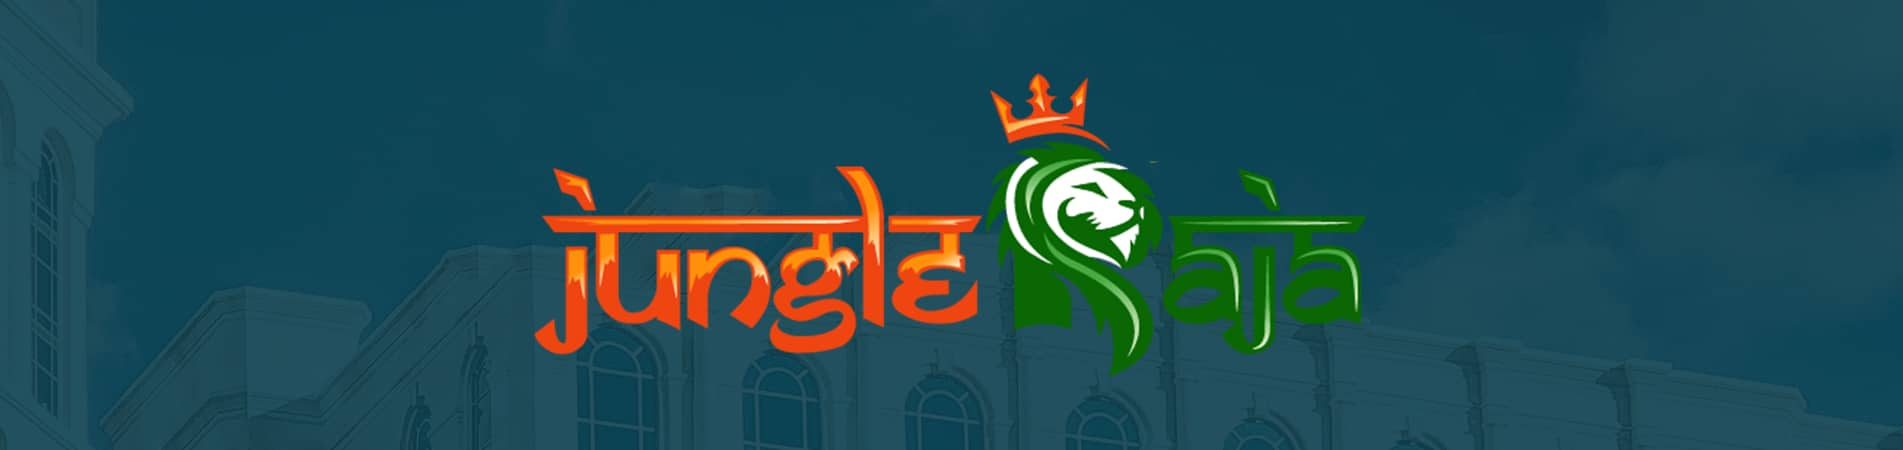 JungleRaja Casino Banner